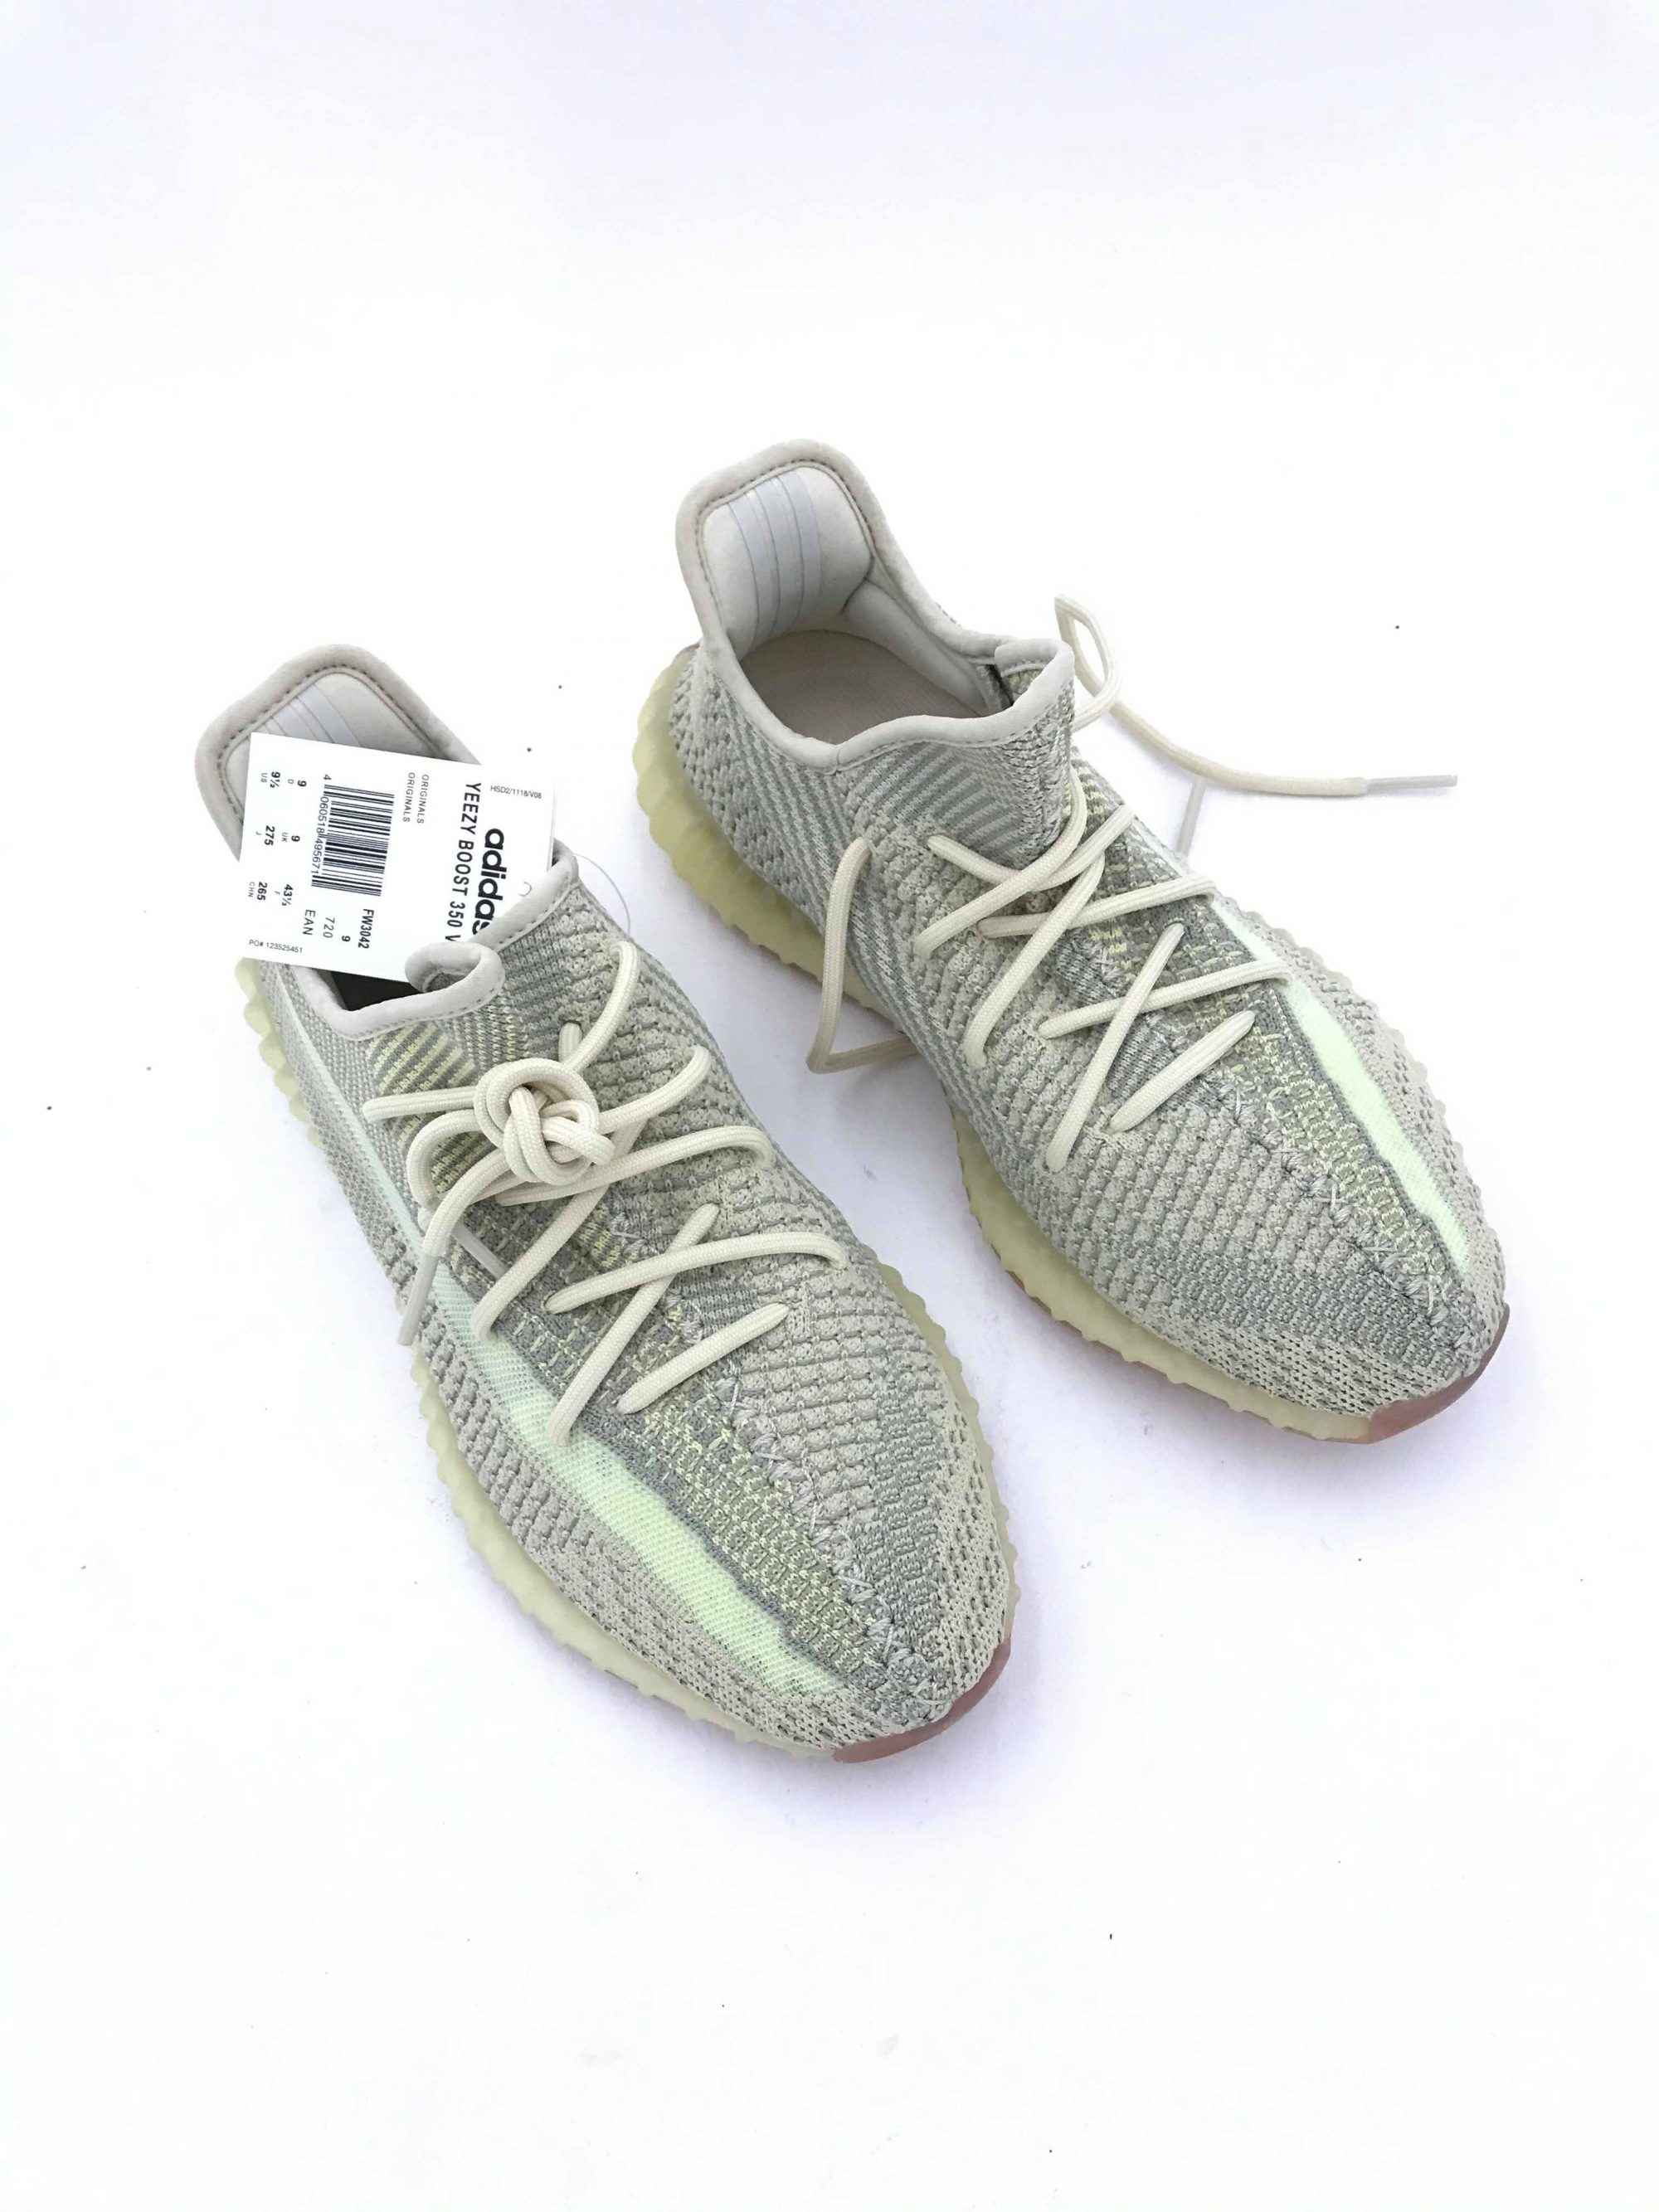 Adidas Yeezy 350 celeste